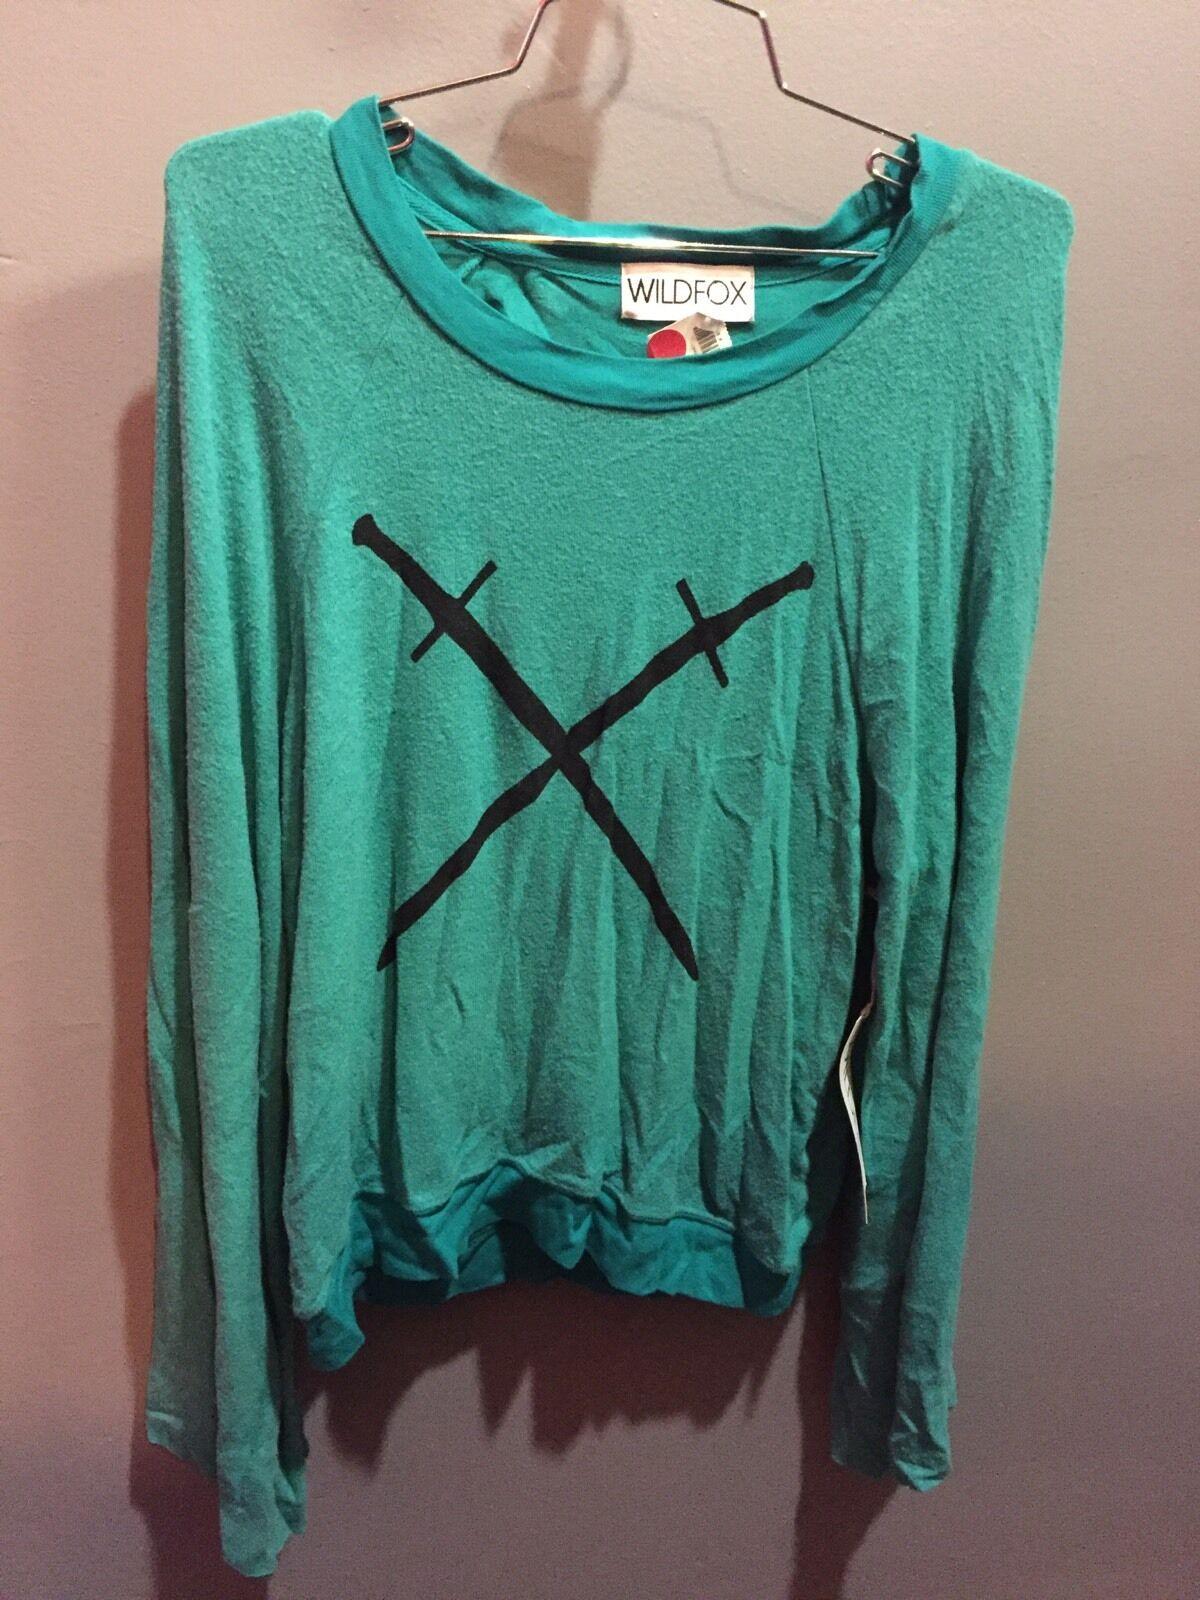 NWT Wildfox Brand Solid Green Crossed Swords Bell Sleeved Sweatshirt